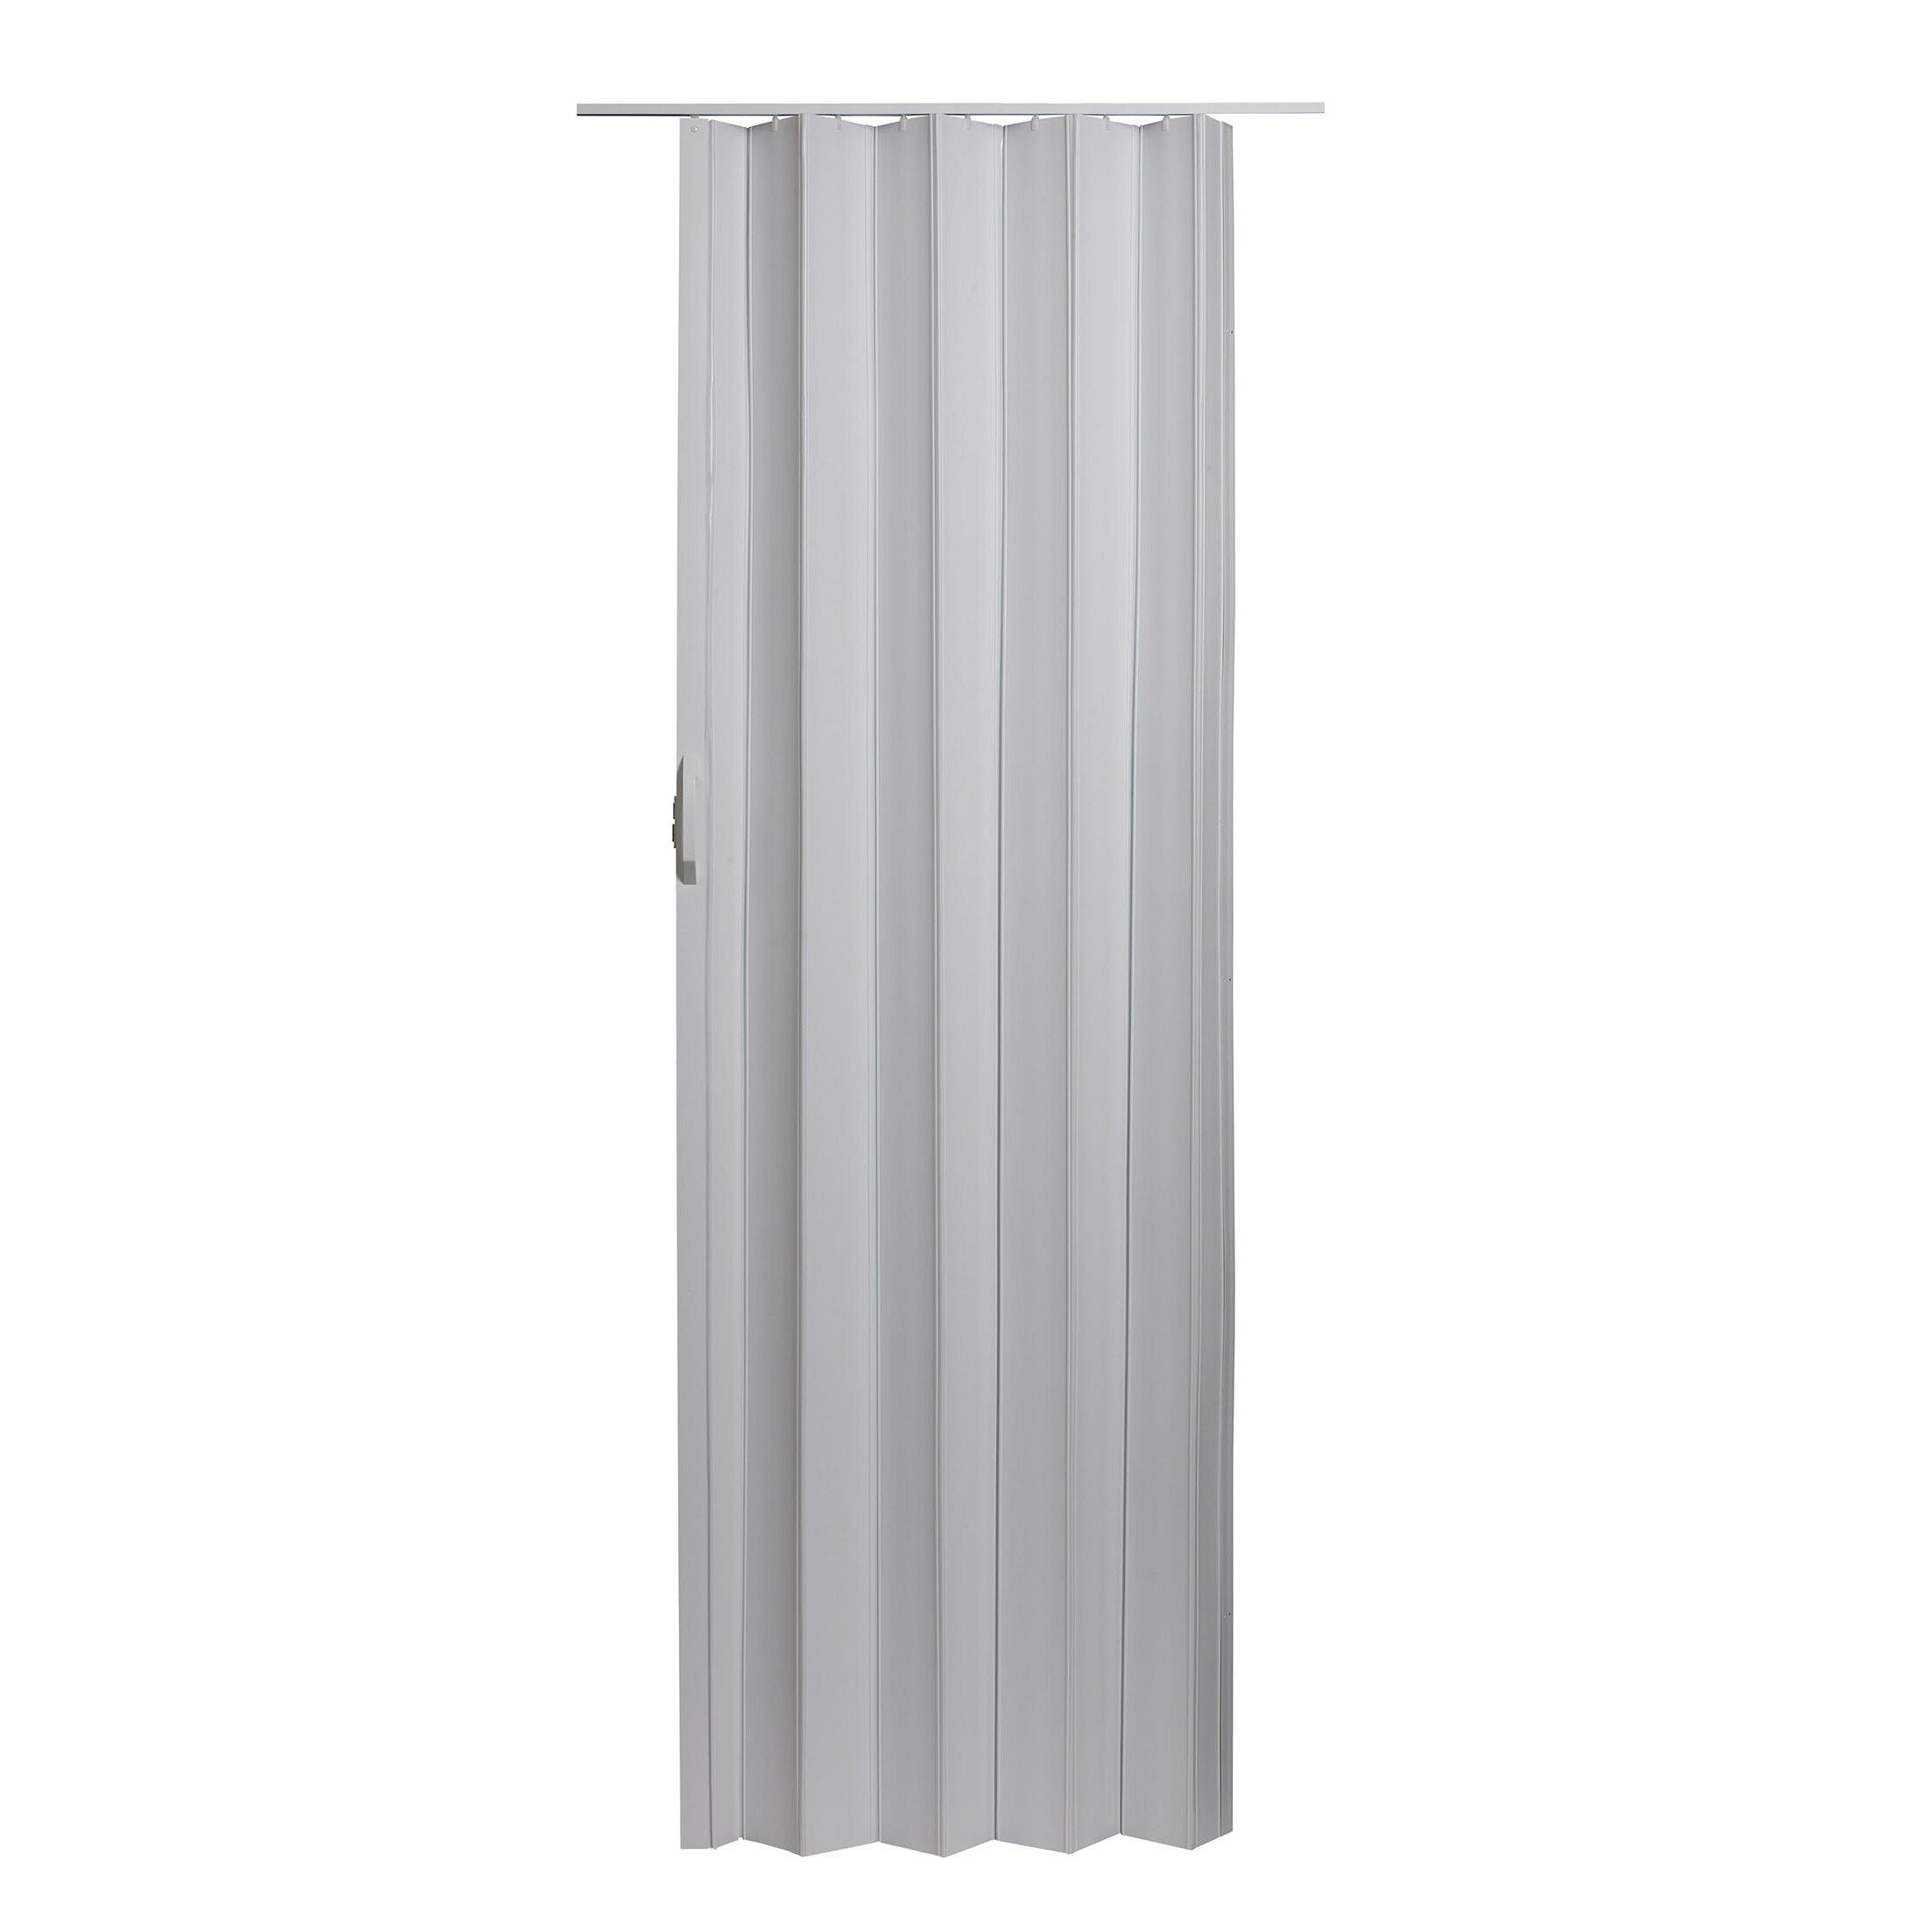 2205 #626569 LTL Accordion Doors Homestyle Vinyl Accordion Interior Door & Reviews  pic Ltl Home Products Inc Folding Doors 29112205